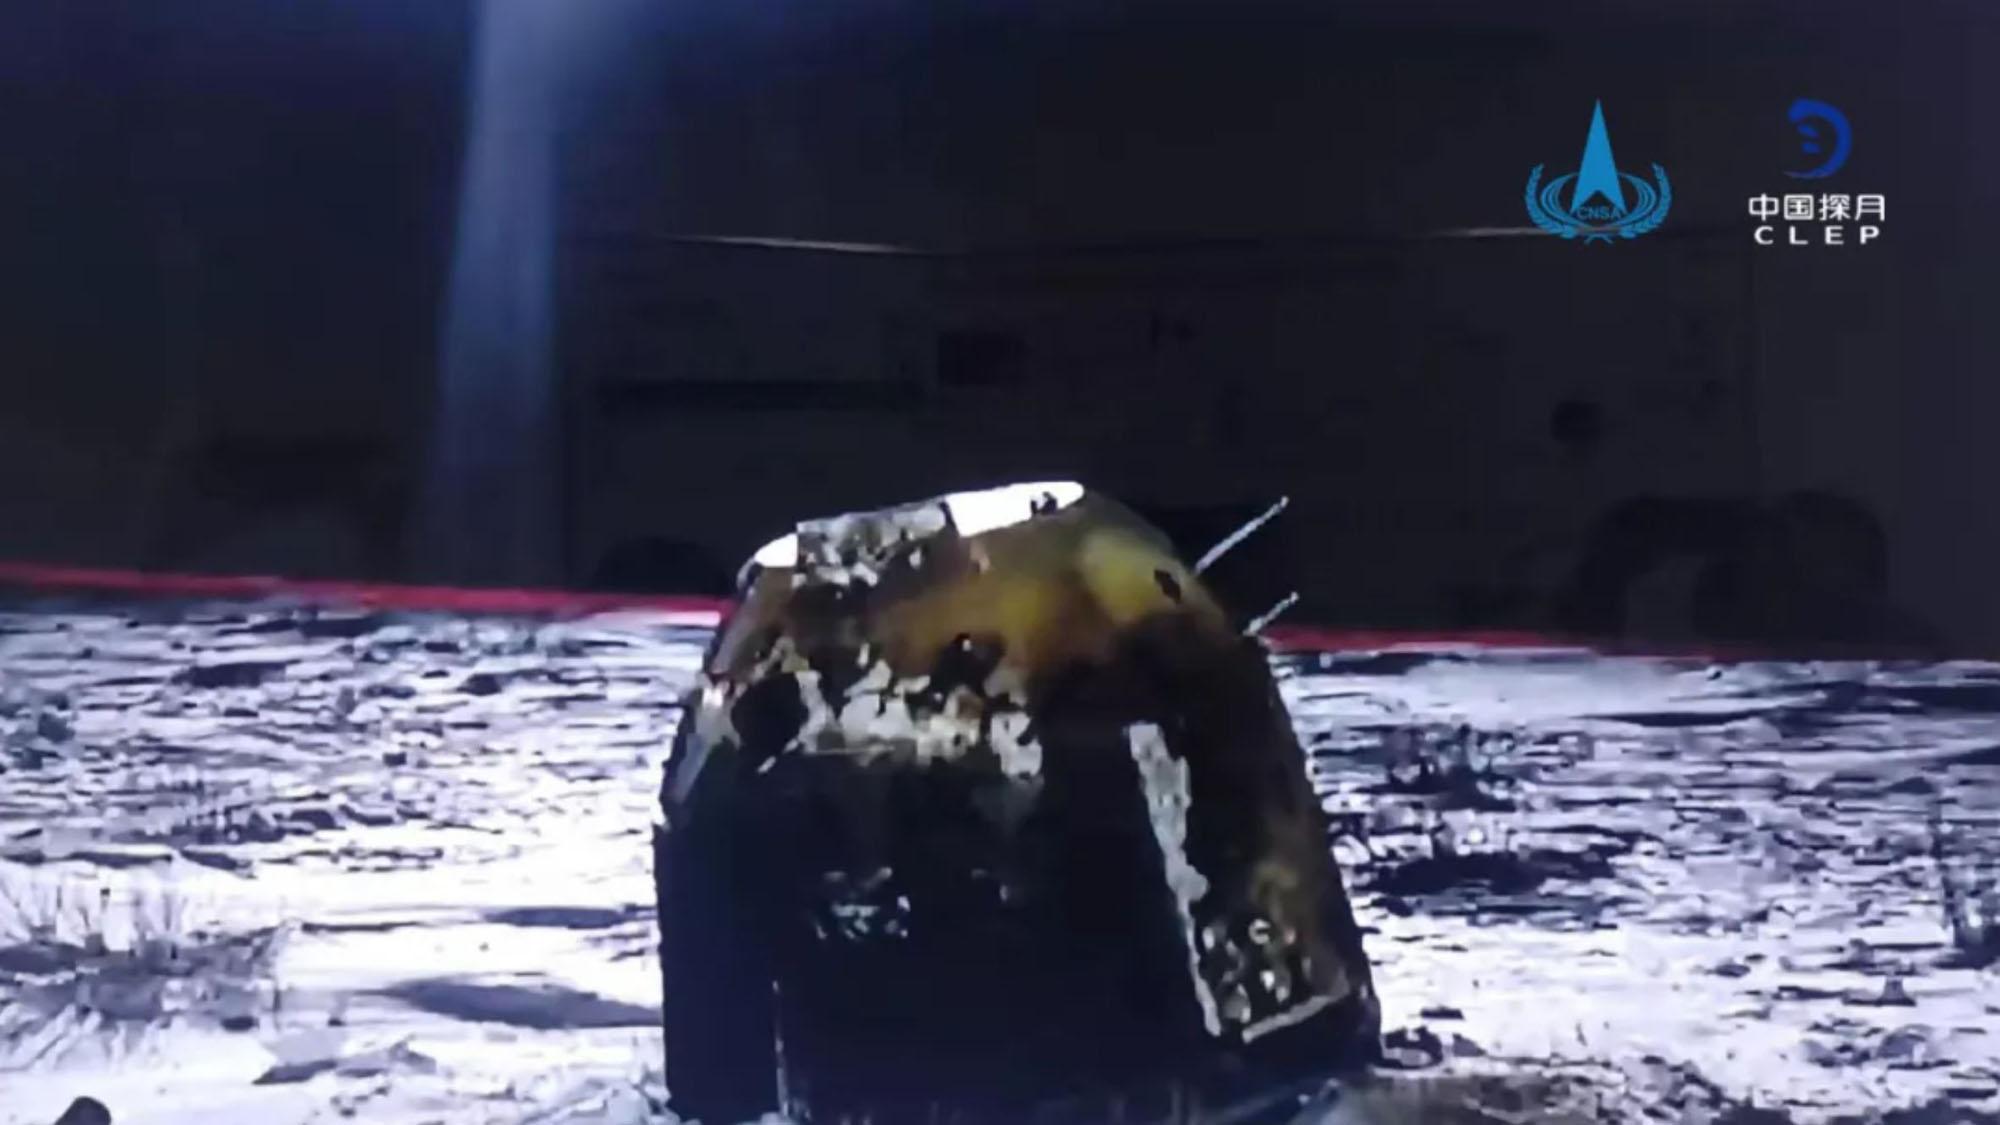 China moon rock studies include fusion energy analysis, volcanic history